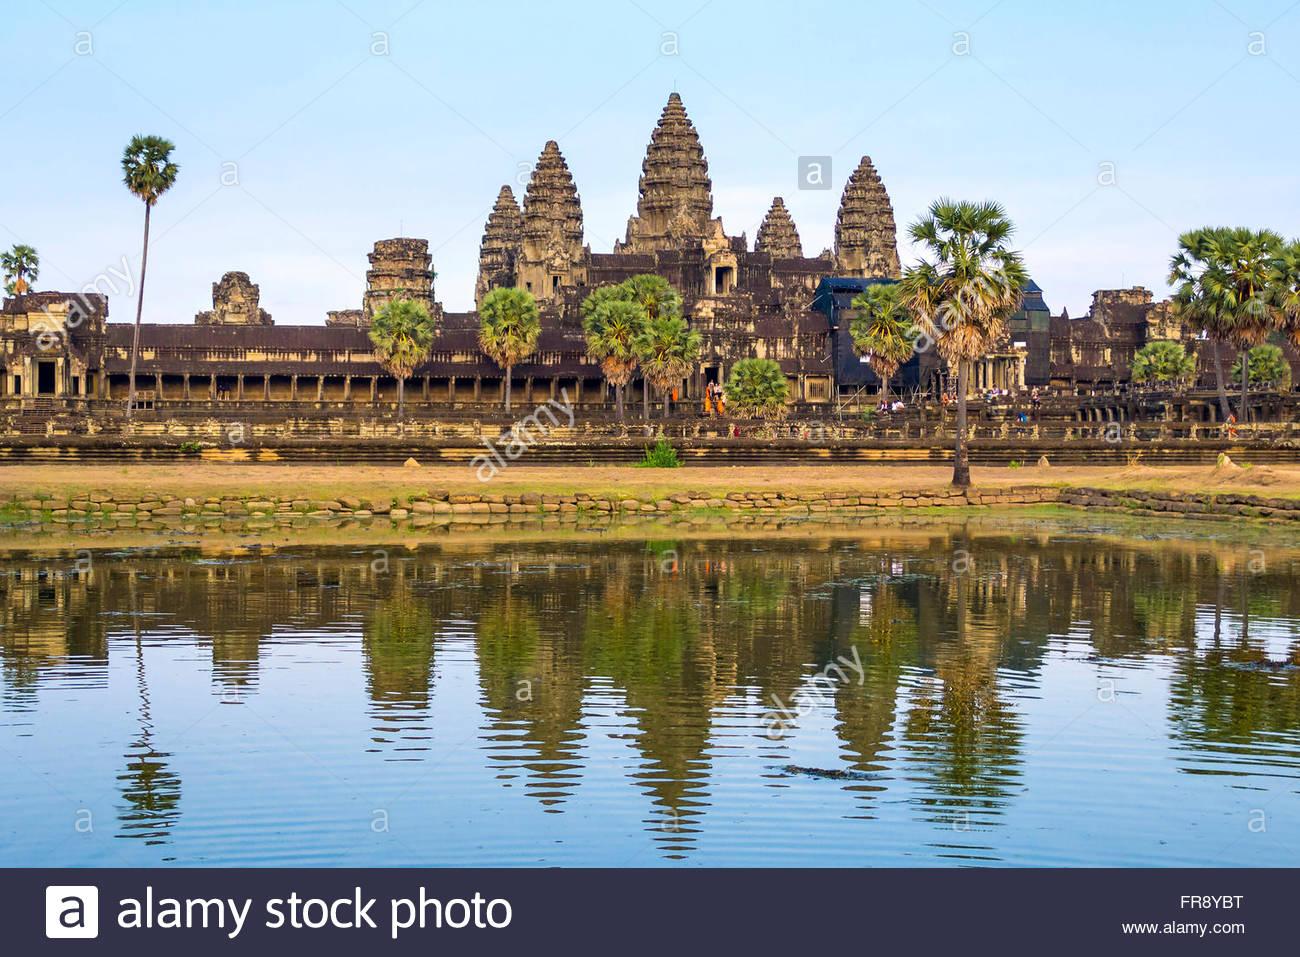 UNESCO-Weltkulturerbe, Angkor Wat, Siem Reap Provinz, Kambodscha Stockbild